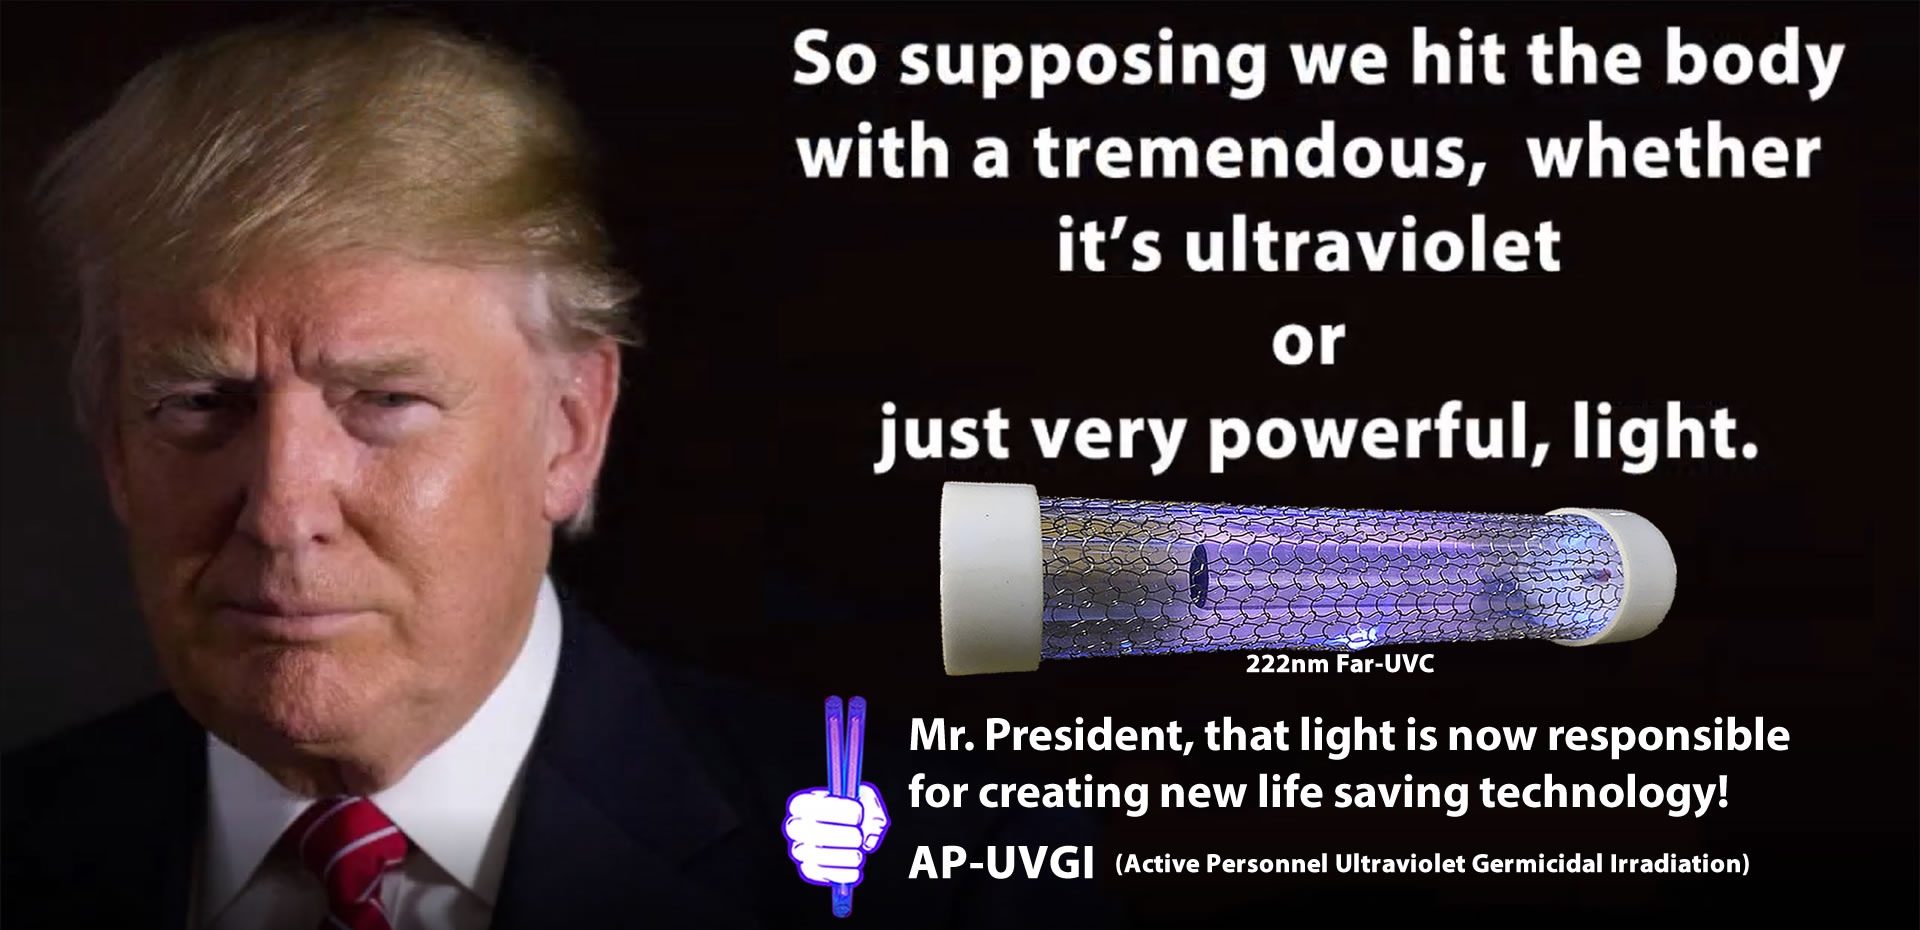 trumps-very-powerful-light-is-a-real-human-safe-germicidal-irradiation-AP-UVGI-using-Far-UVC-207nm-222nm-light